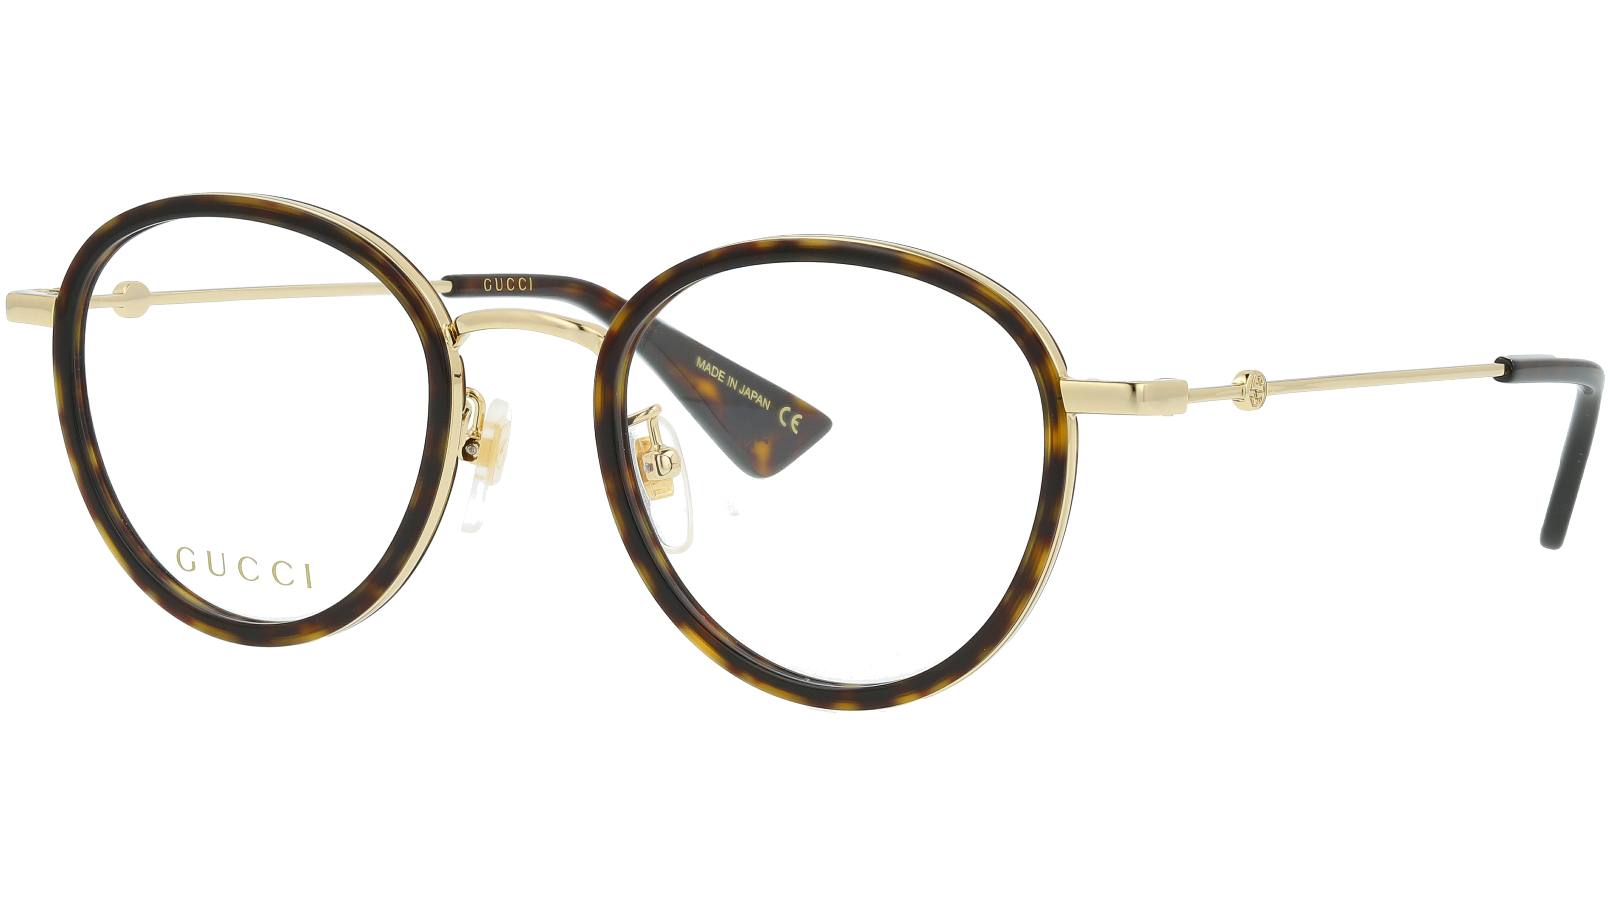 Gucci GG0608OK 003 49 Havana Round Glasses